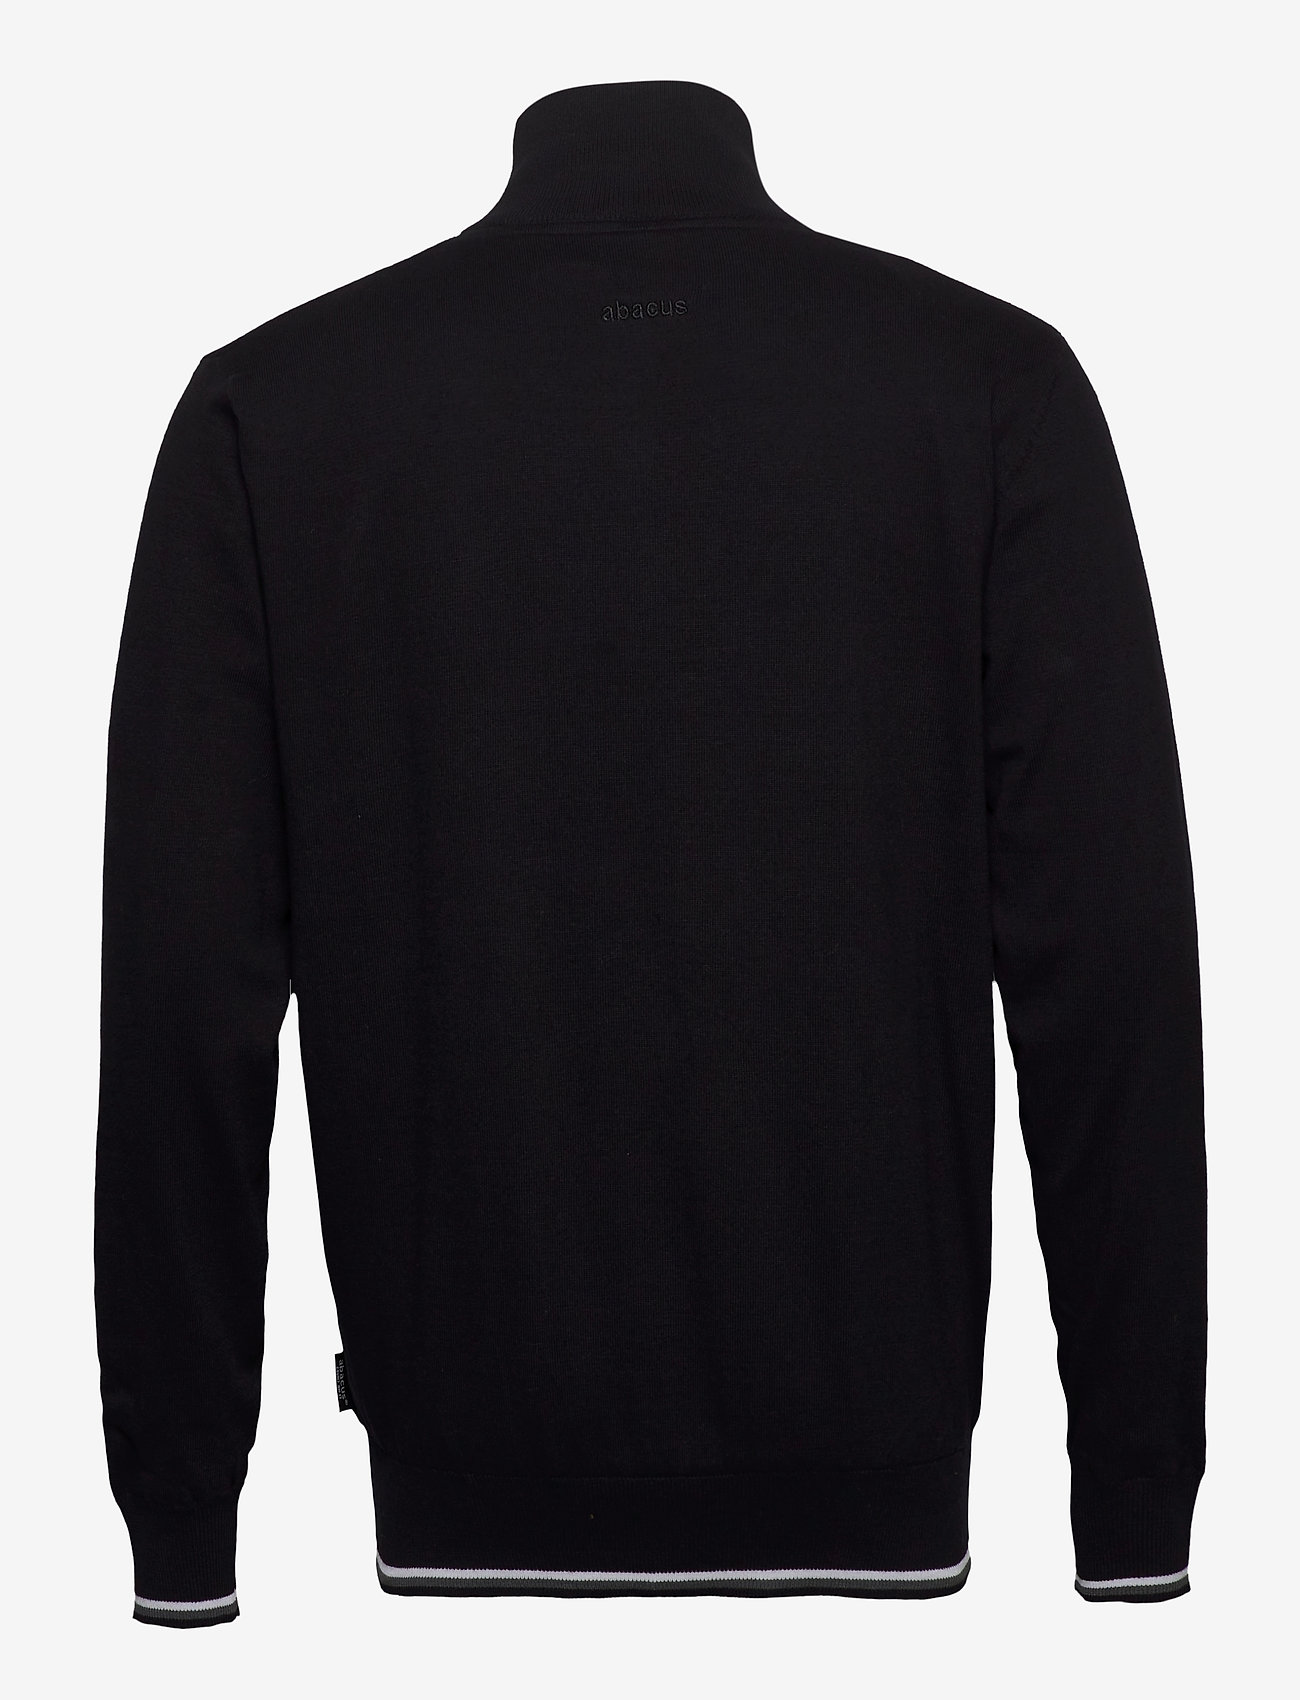 Abacus Mens Dubson windstop pullover - Strikkevarer BLACK - Menn Klær